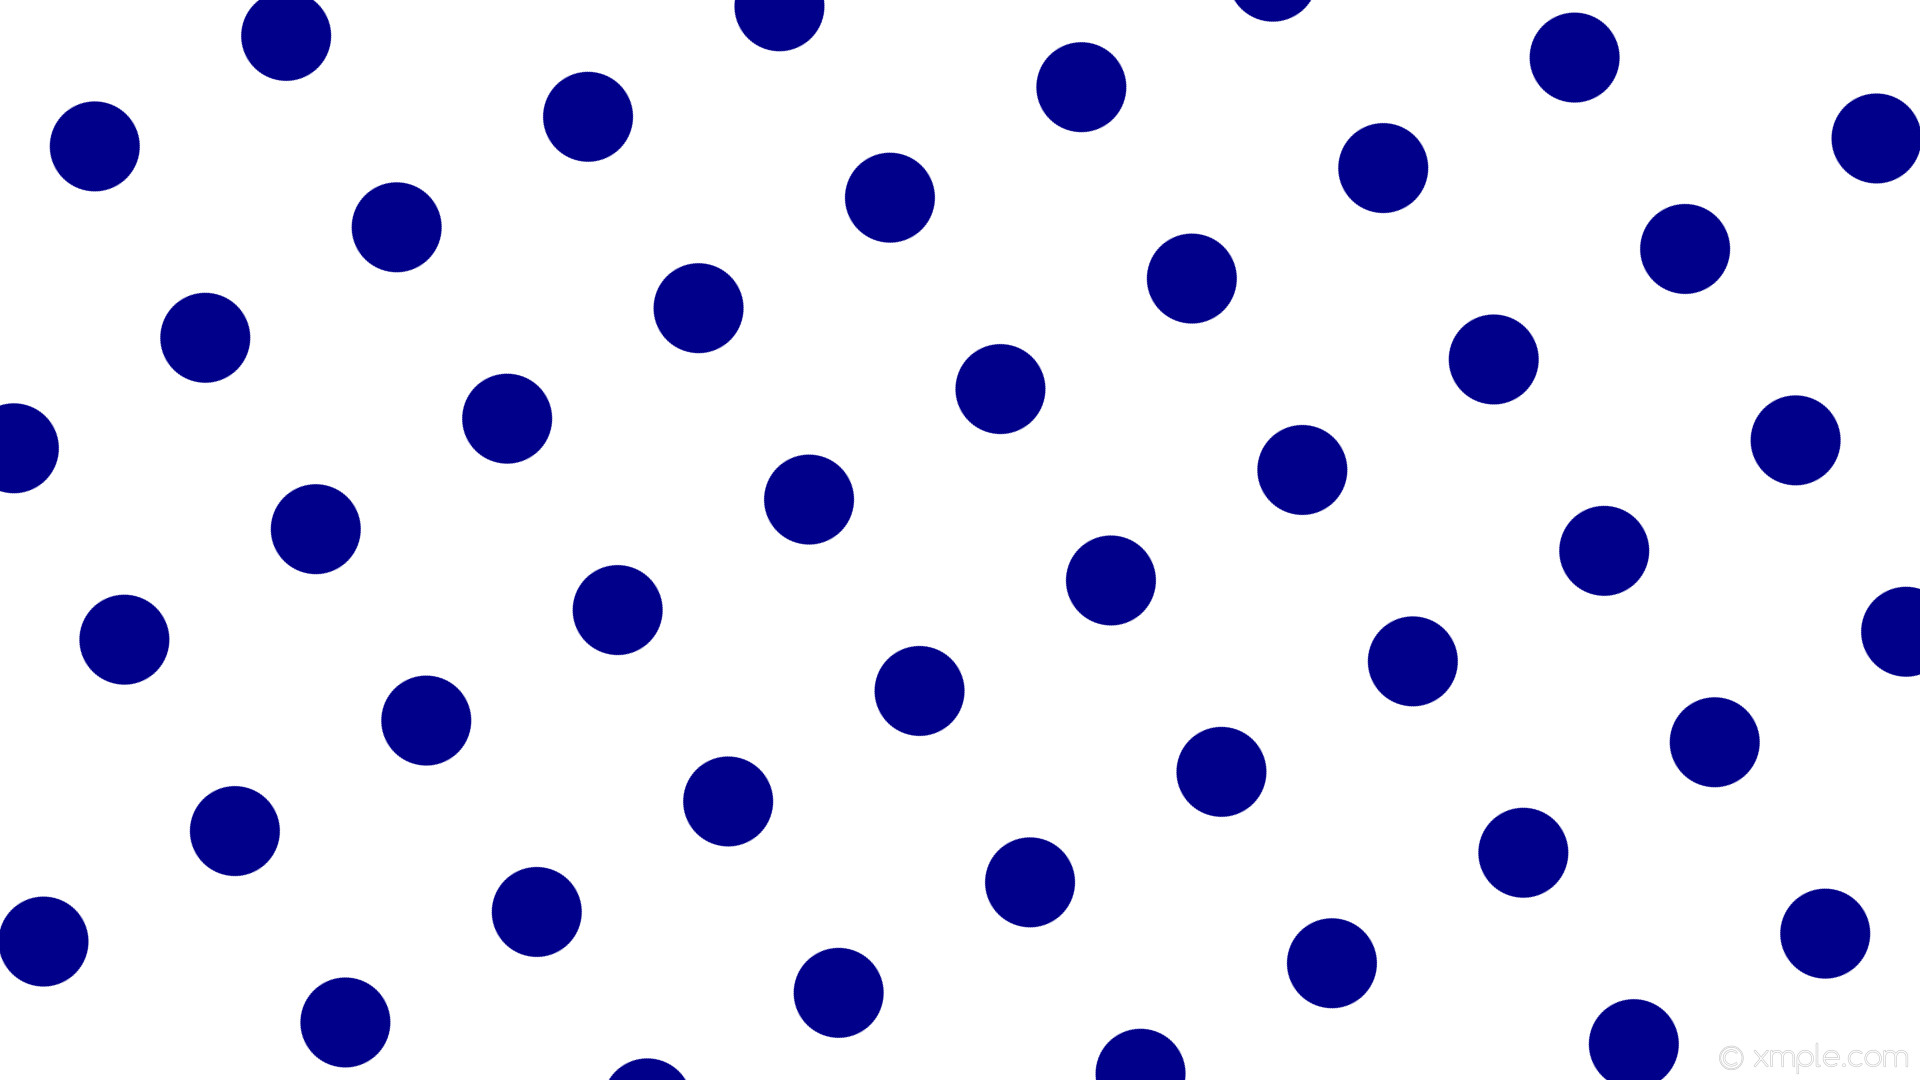 wallpaper blue polka dots spots white dark blue #ffffff #00008b 210° 90px  221px